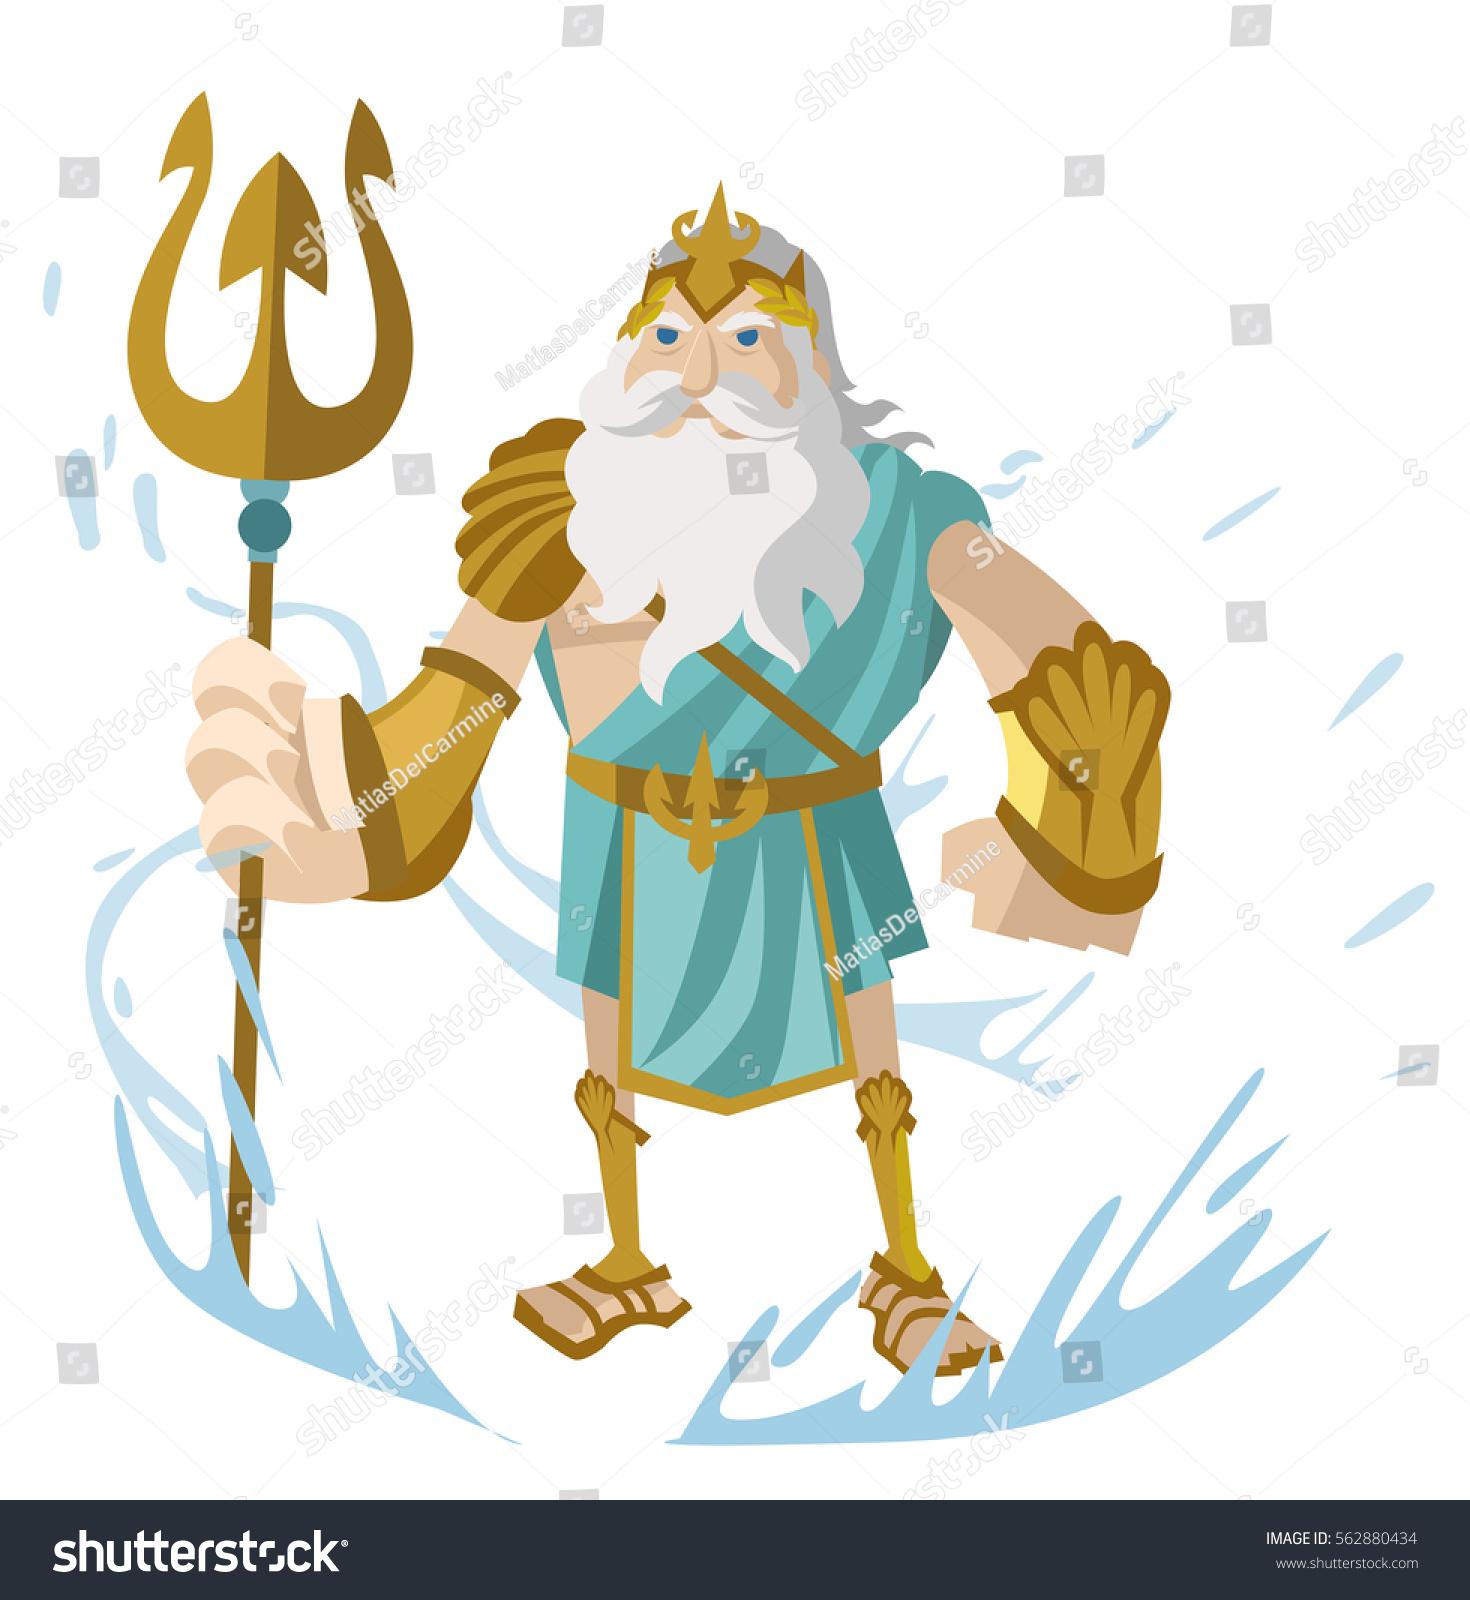 poseidon neptune greek roman god sea stock vector 2018 562880434 rh shutterstock com Greek God Symbols Greek God of Dreams